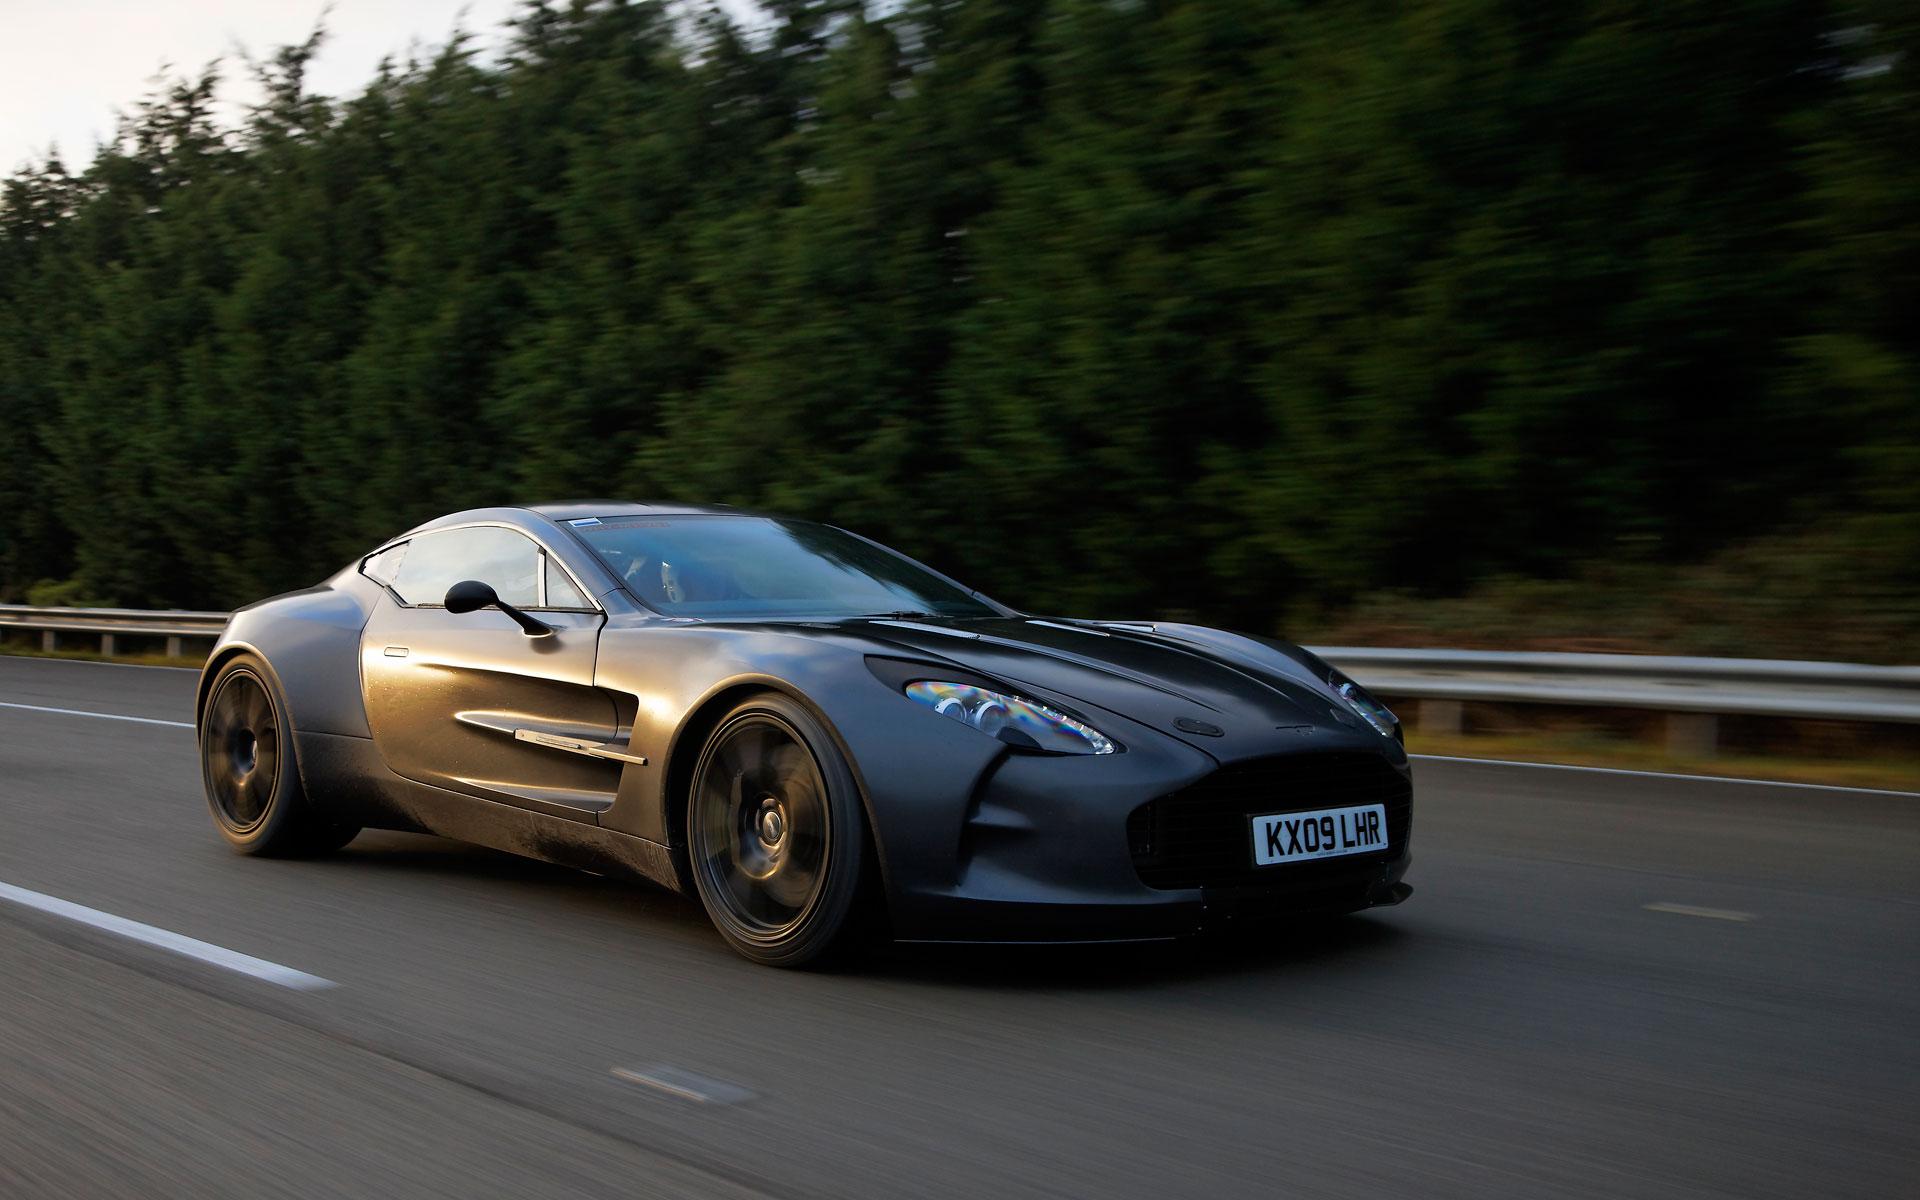 Aston Martin Cars Related Imagesstart 200 Weili Automotive Network